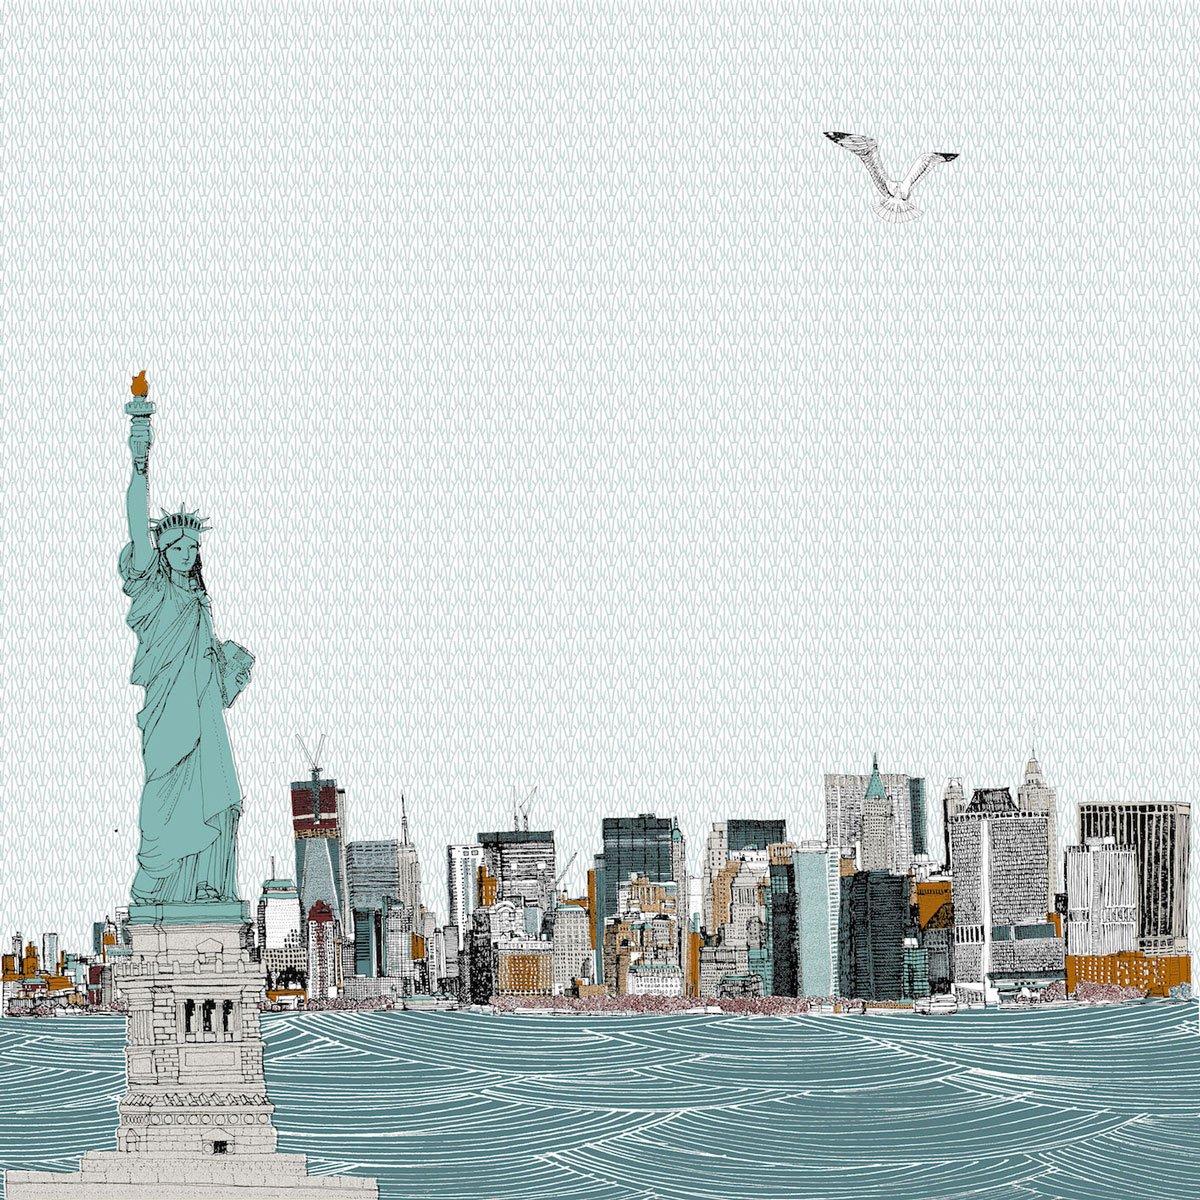 Clare Halifax - Hey Lady Liberty, 7 colour screen print. 35 x 35cm